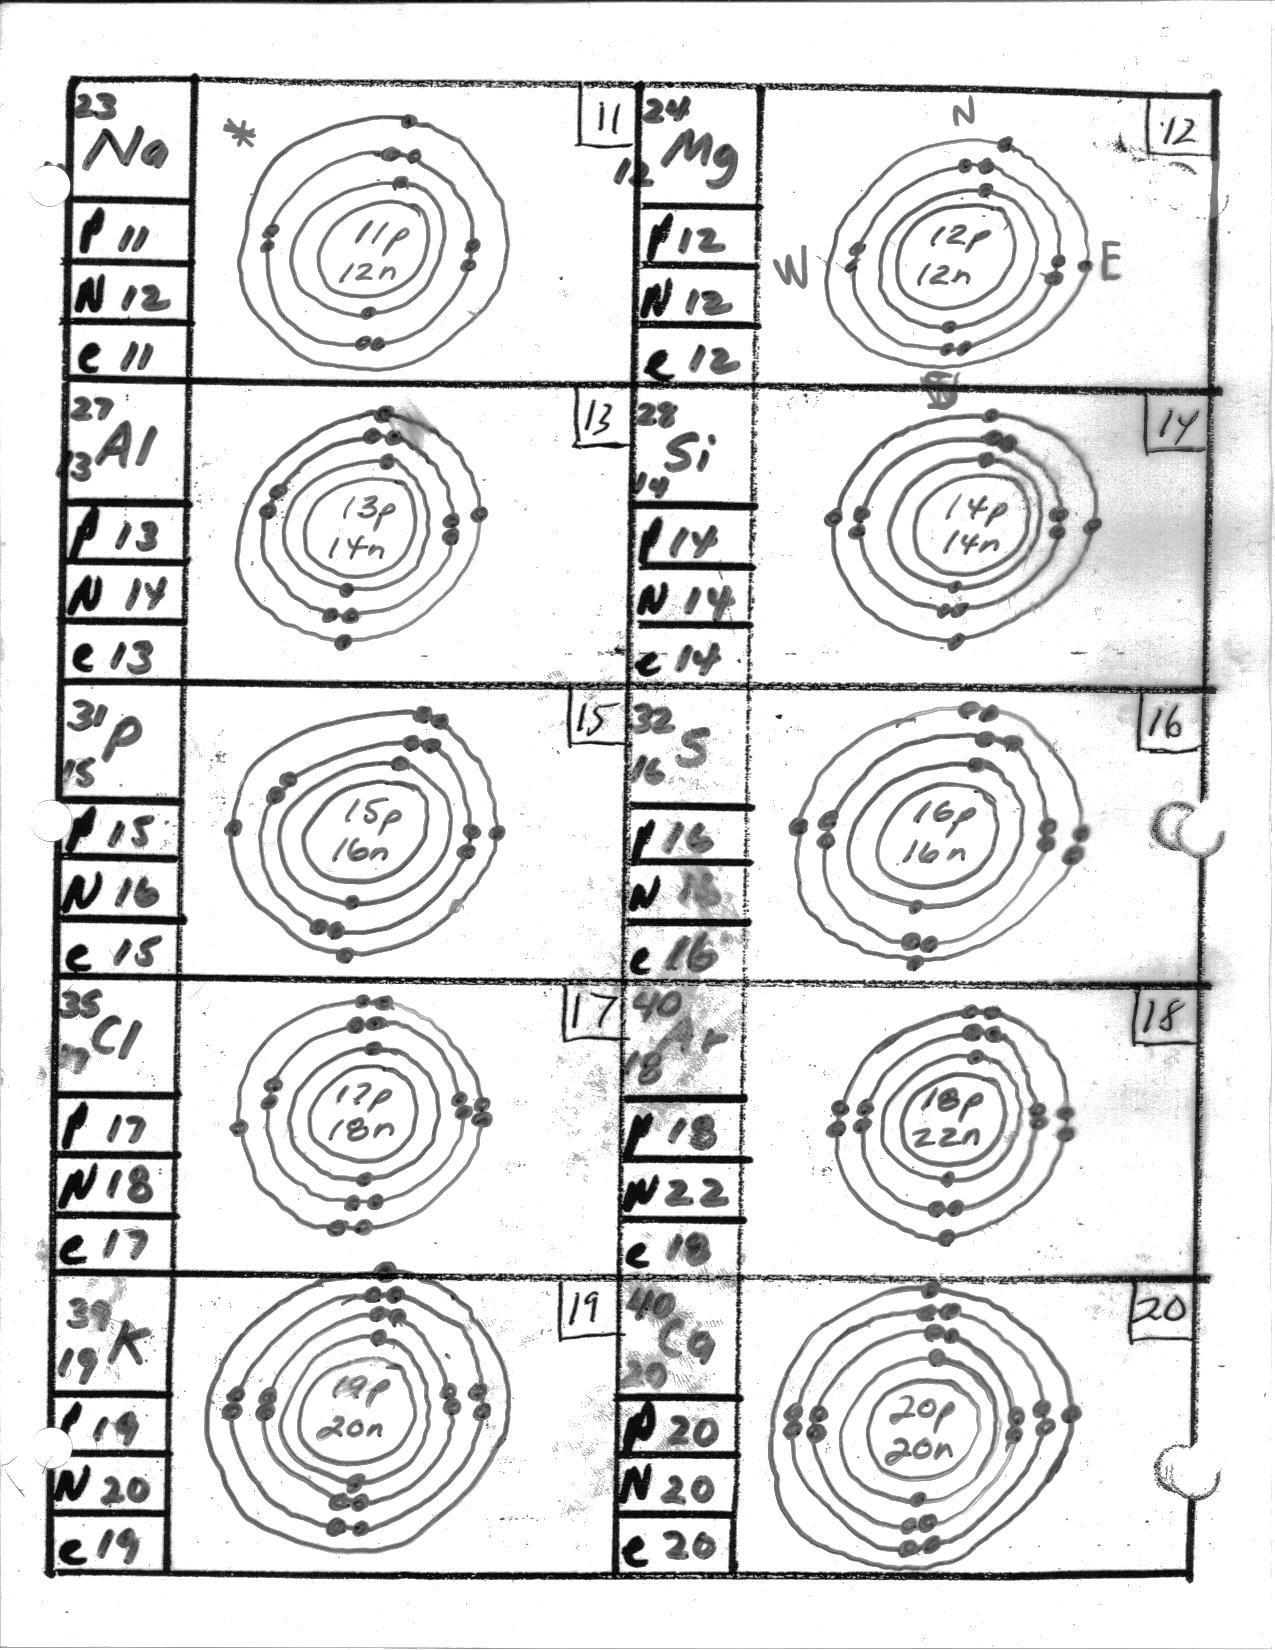 Bohr Model Of The Atom Worksheet Photos